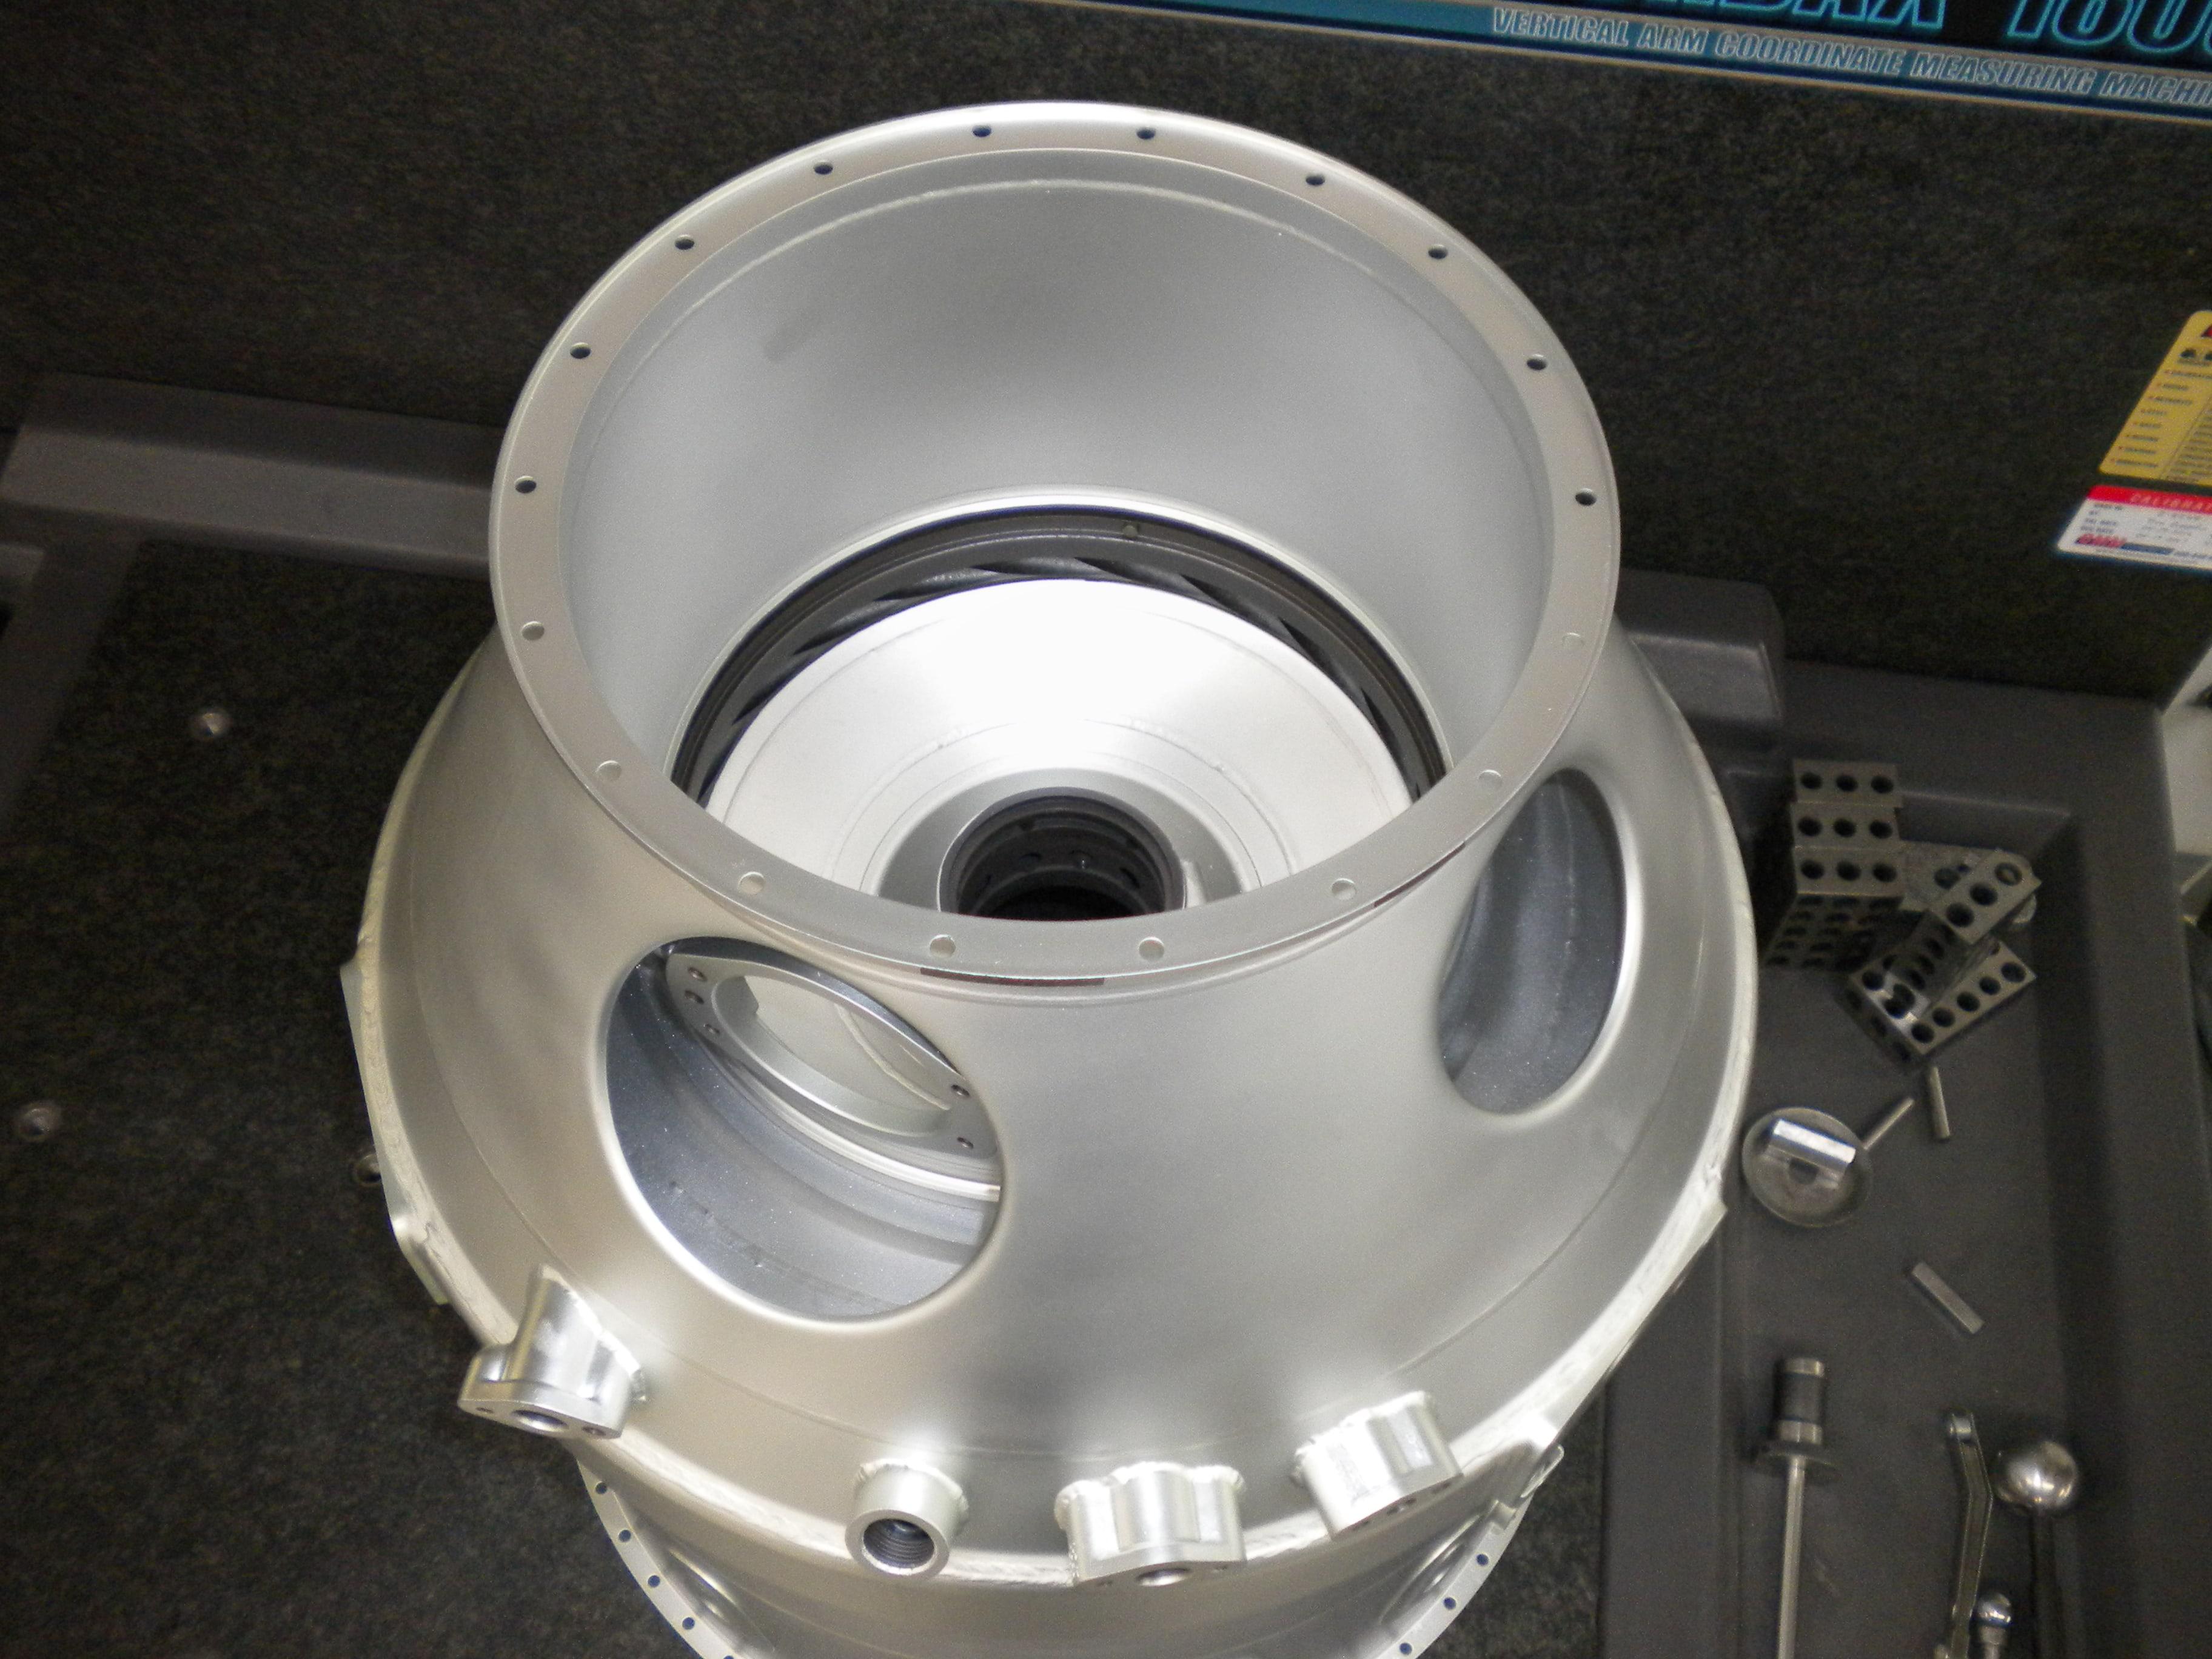 flight turbine engine repair  u0026 overhaul  der repairs  ok